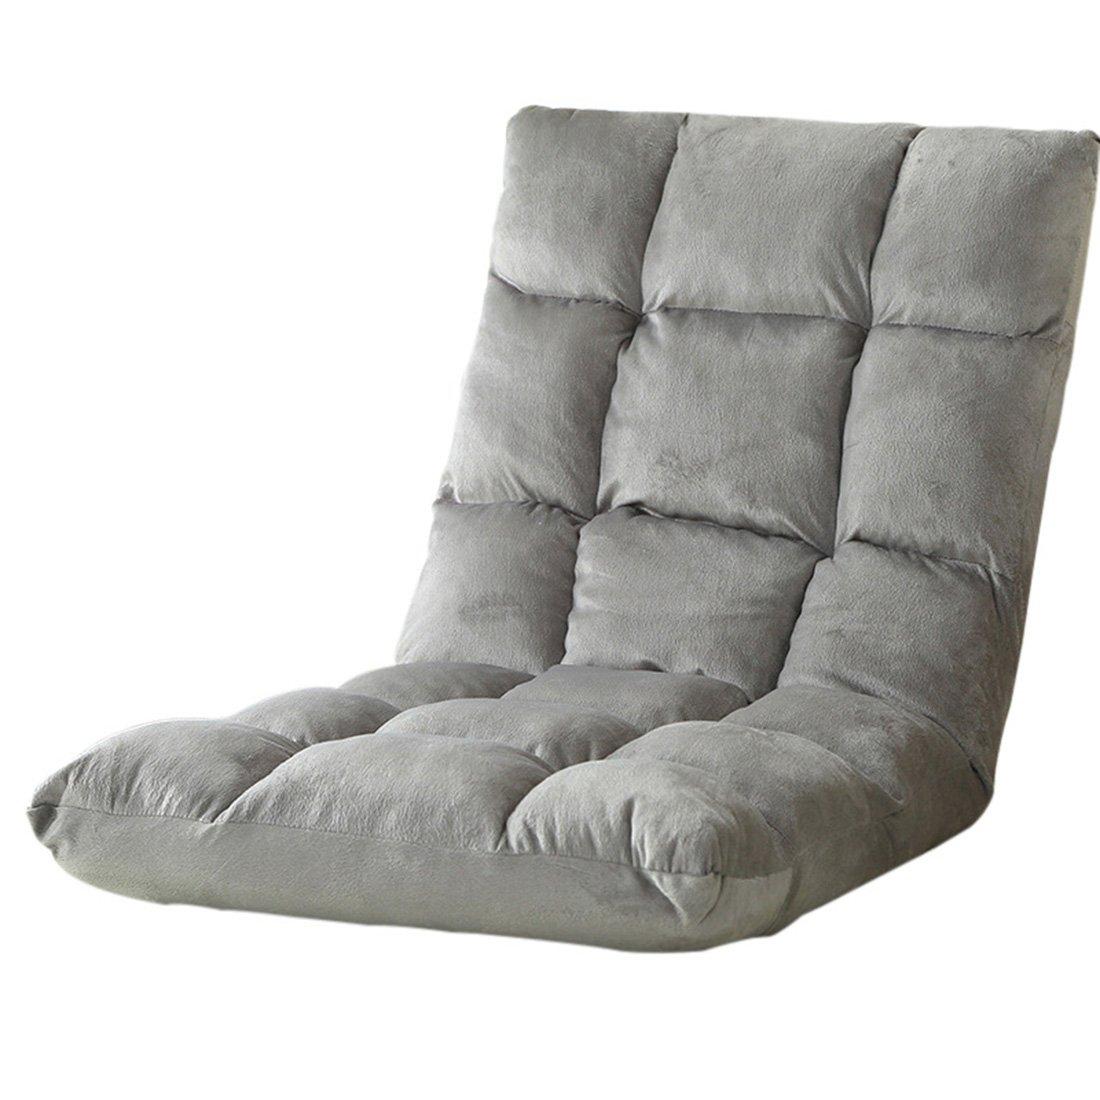 Jiyaru Adjustable Floor Chair Folding Cushion Lounger Gaming Padded Lazy Sofa Grey L